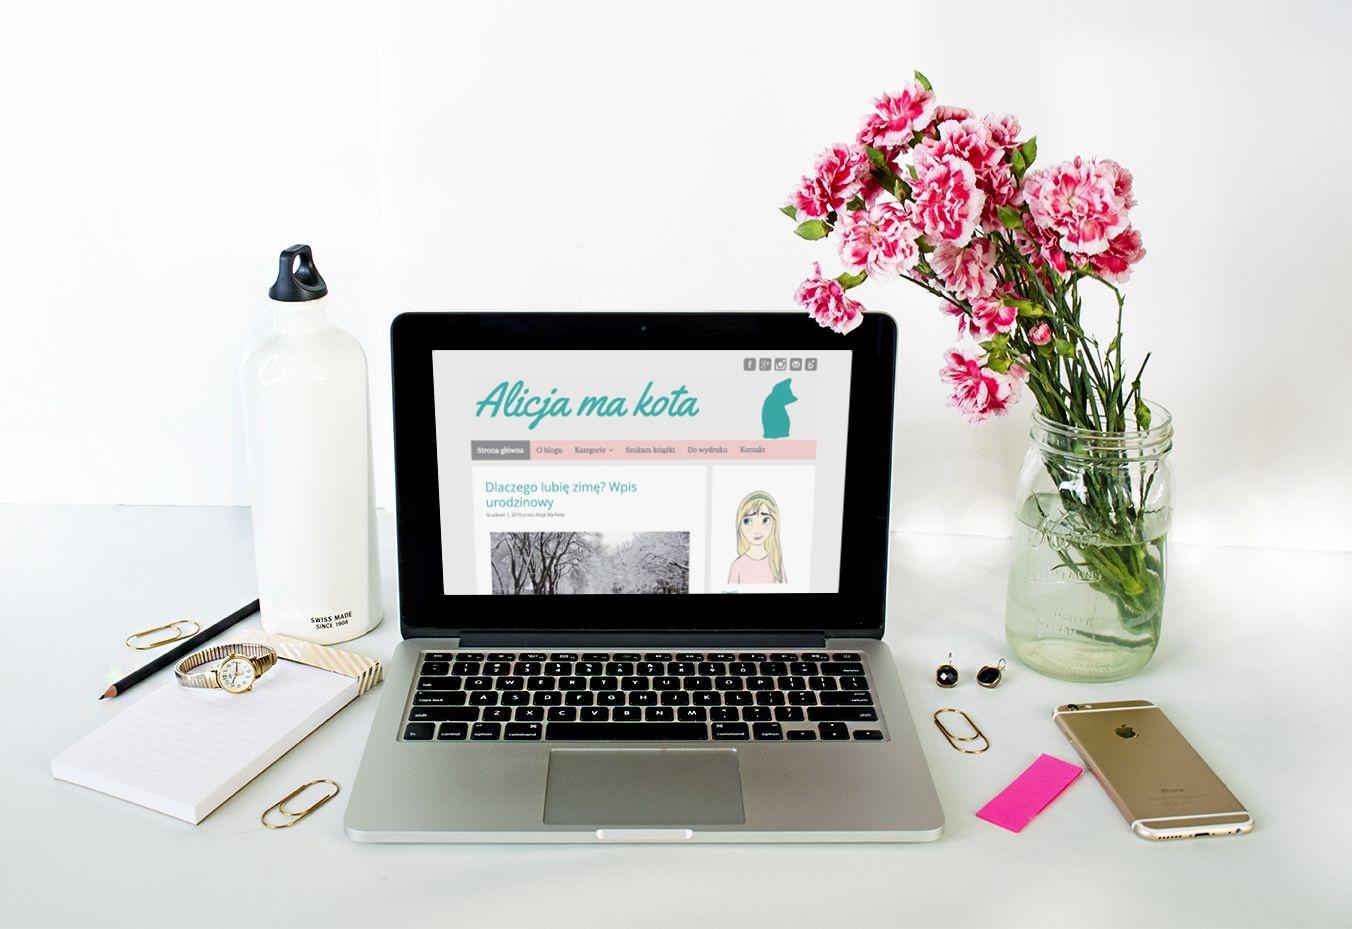 zalozyc bloga